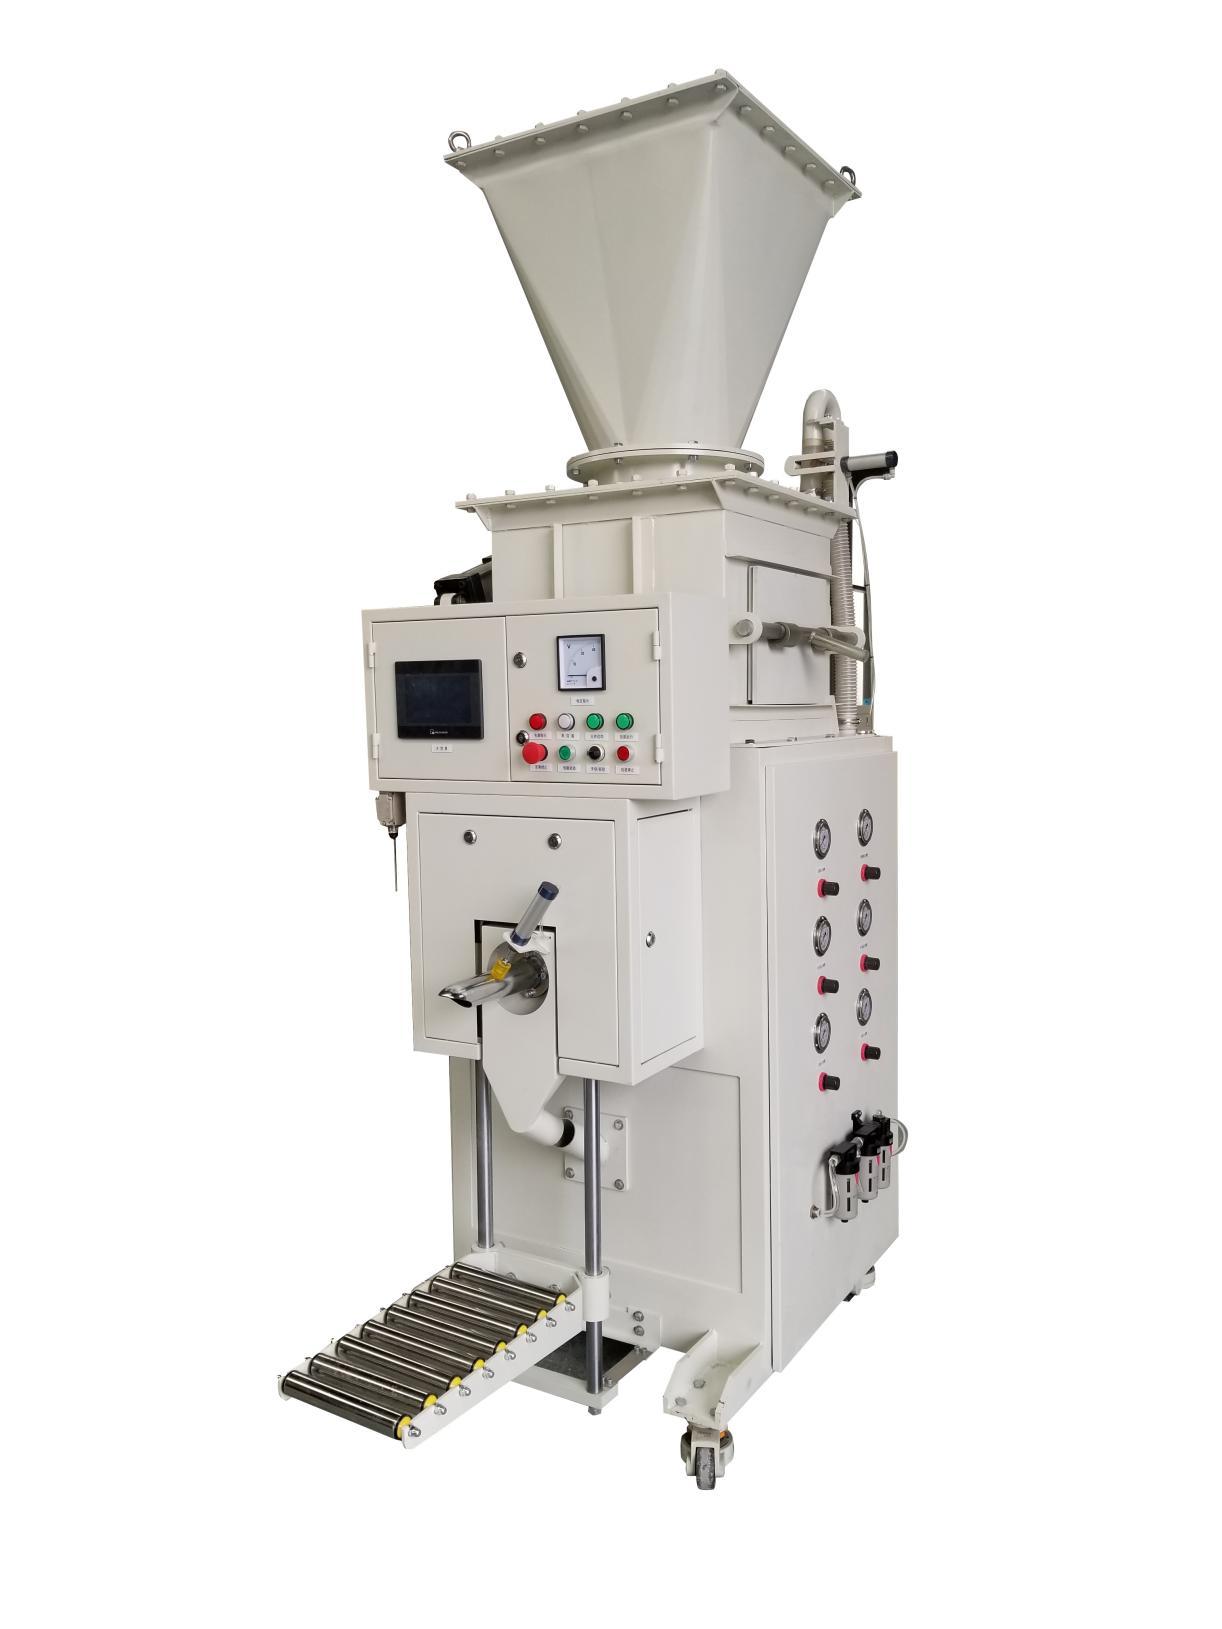 HG5000粉体包装机-营口瑞丰粉体设备有限公司